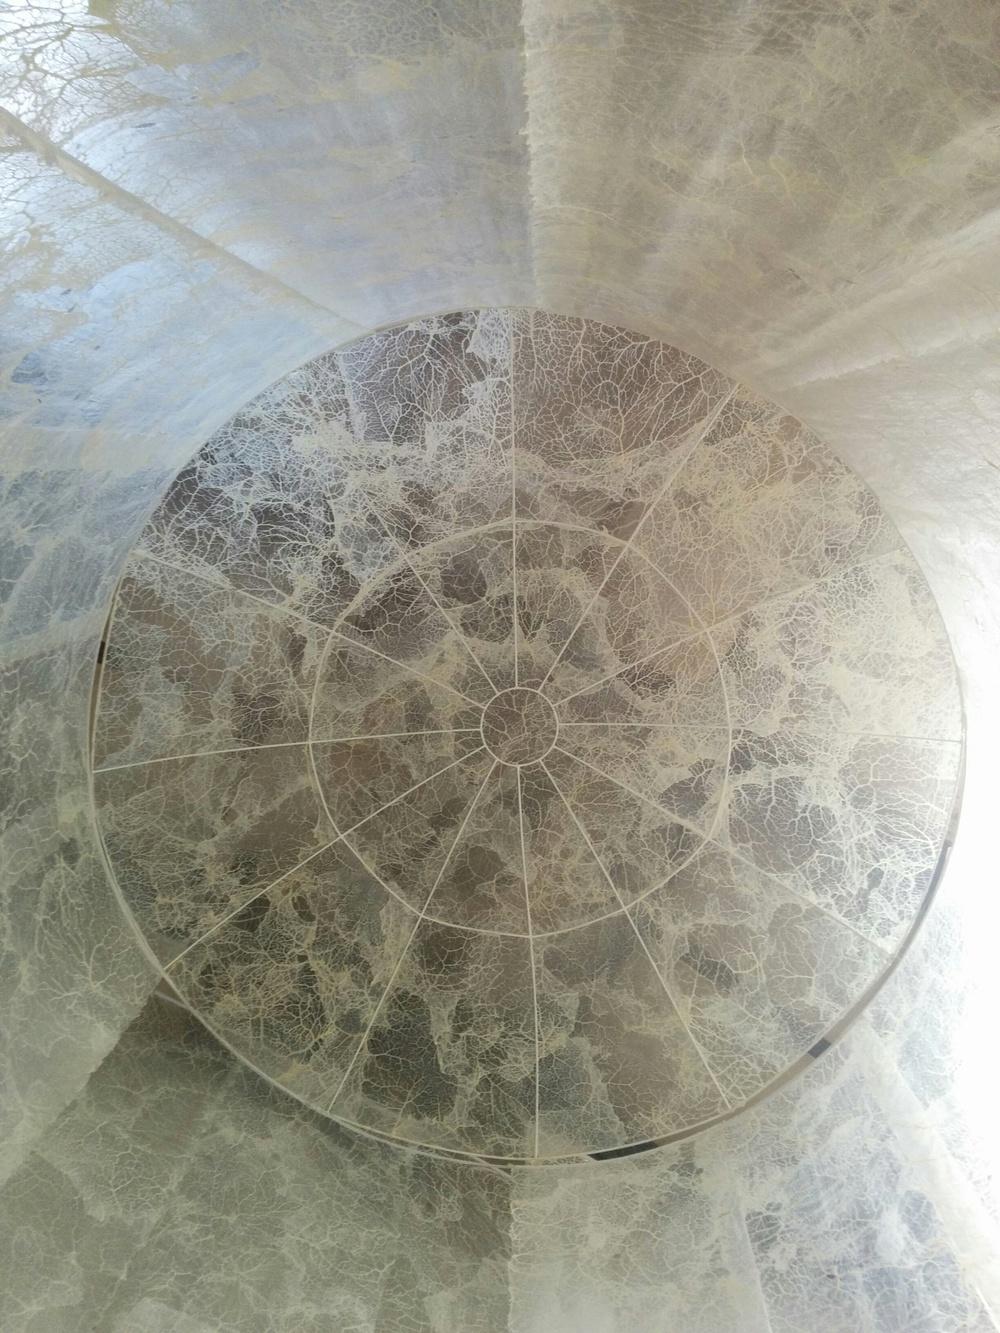 Elpida Hadzi-Vasileva, Fragility (Roof detail)